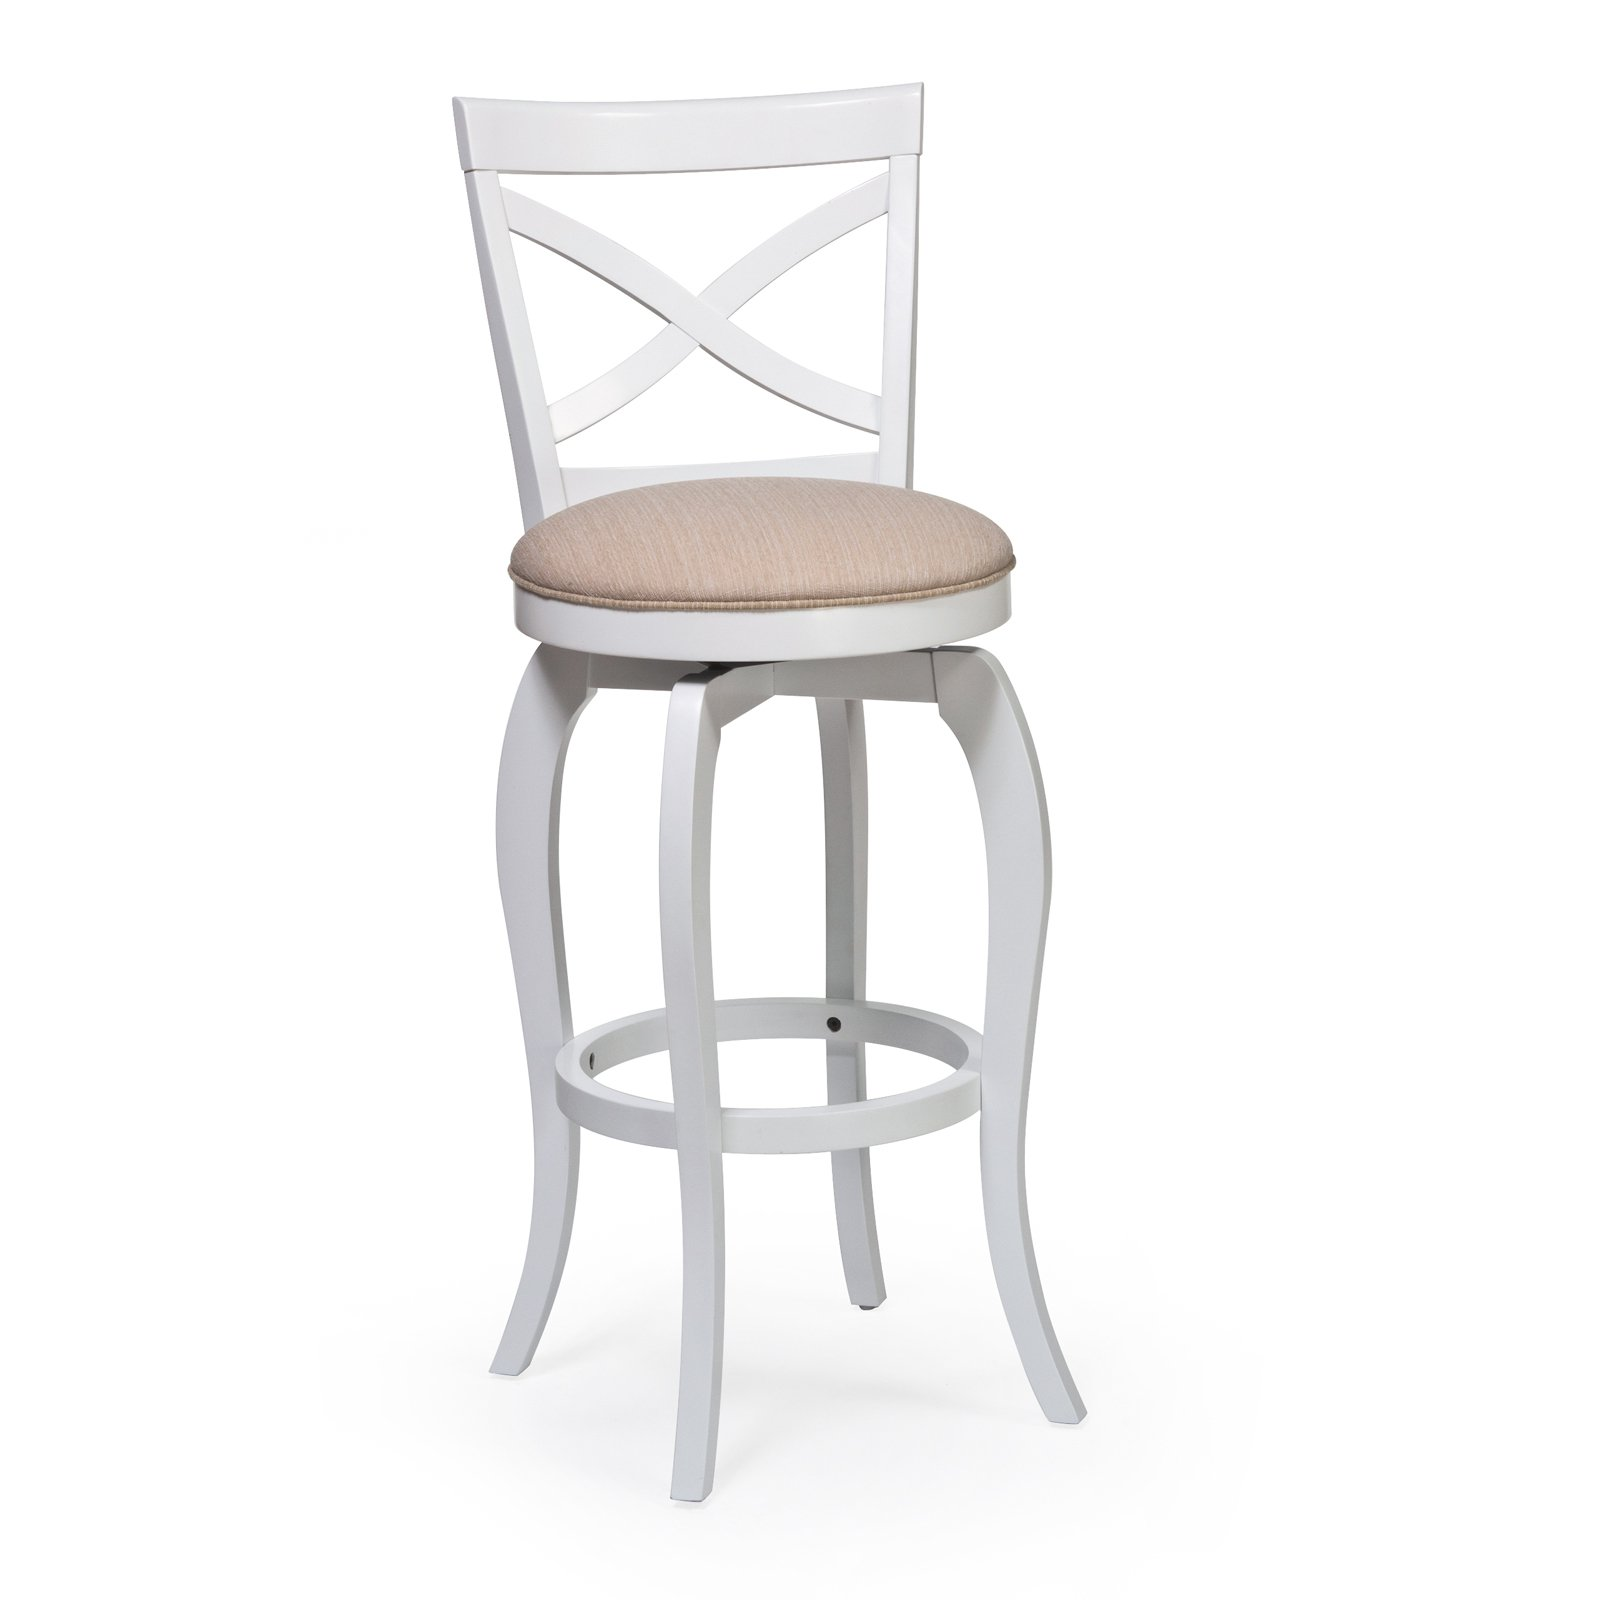 "25"" Ellendale Wood Counter StoolWhite - Hillsdale Furniture"